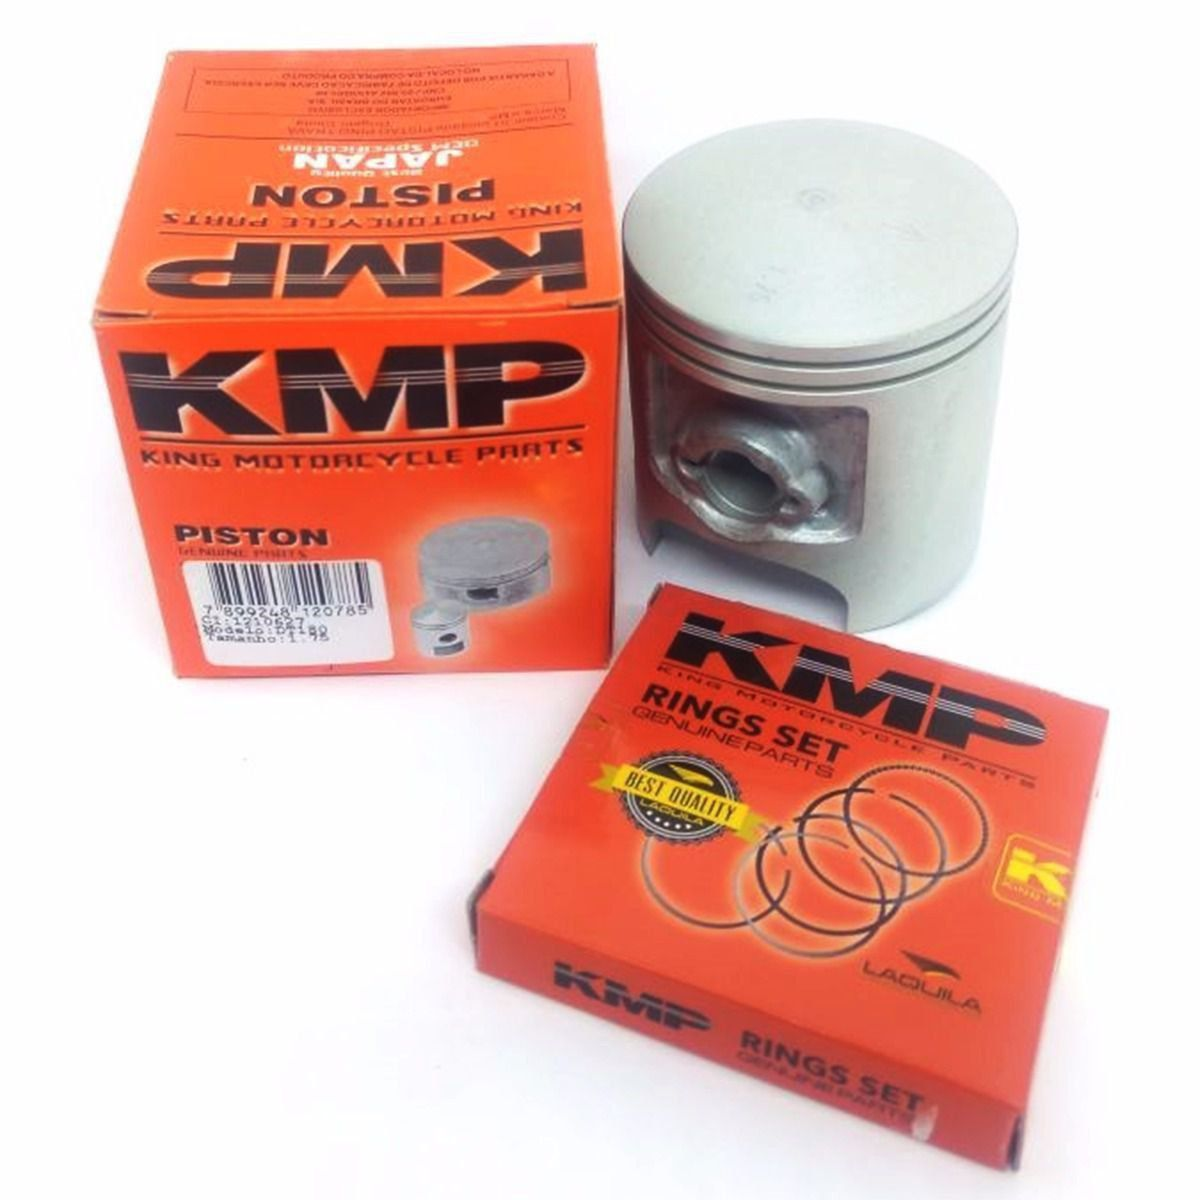 Kit Pistão Kmp Com Anéis Dt 180 Std Á 2.00mm